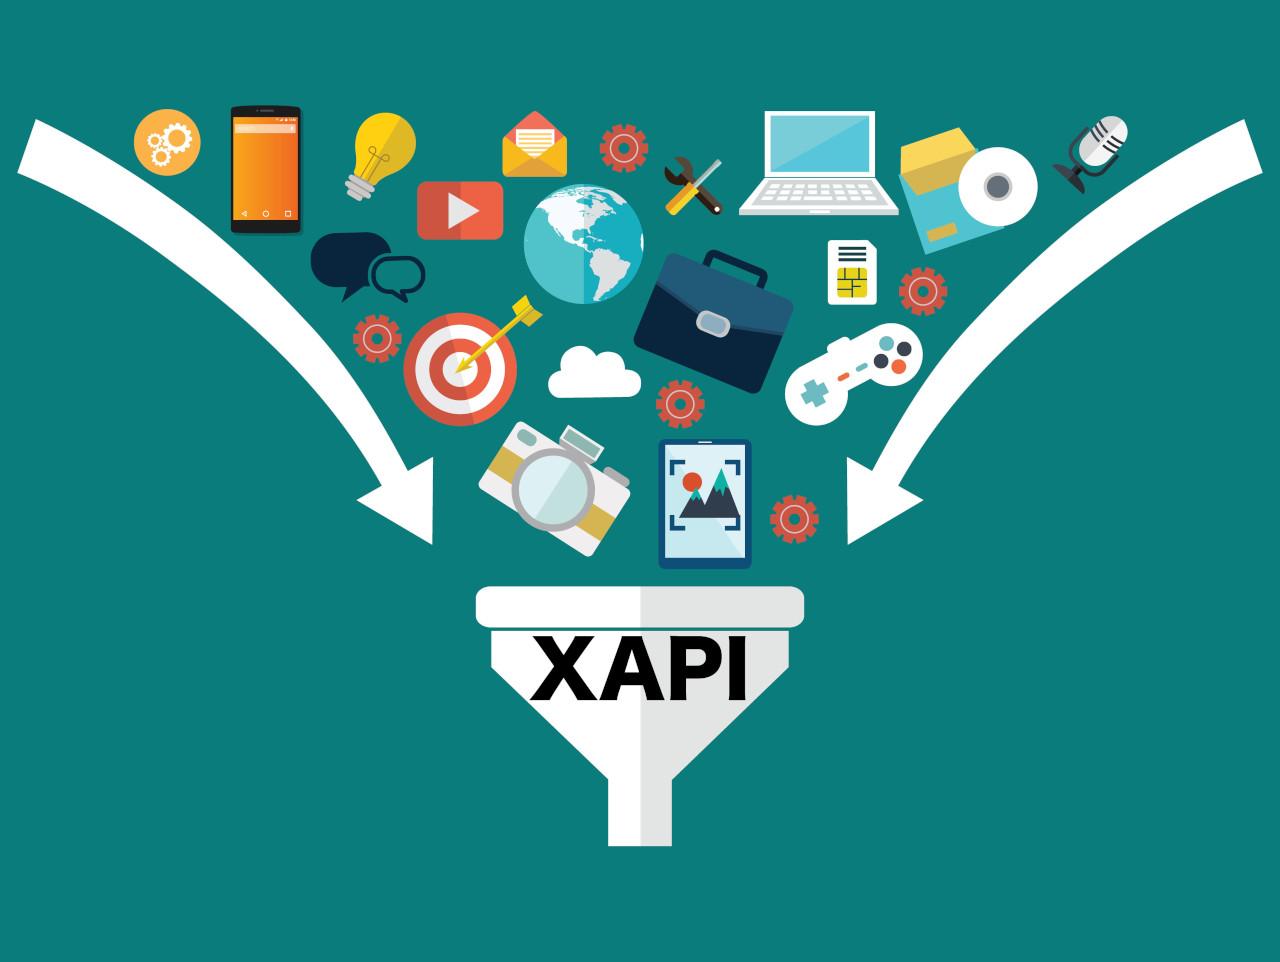 xAPI - fonte www.xapi.com